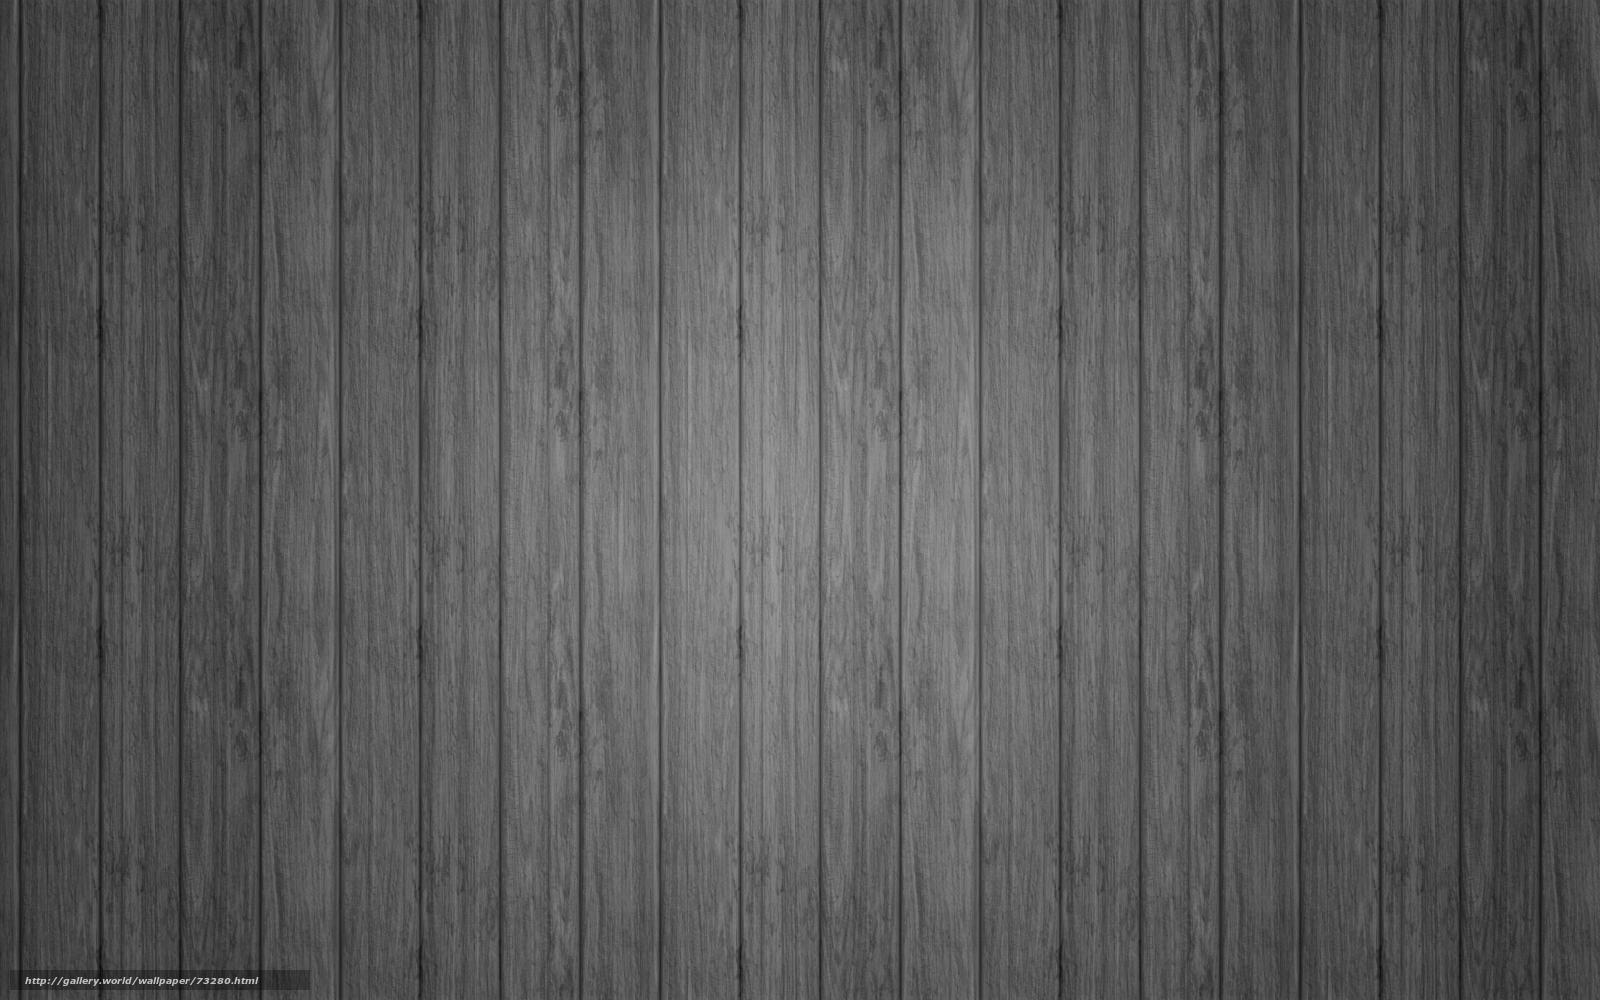 http://st.gdefon.ru/wallpapers_original/wallpapers/73280_doski_chyornyj_ryad_tekstura_fon_derevo_oboi_2560x1600_(GdeFon.ru).jpg